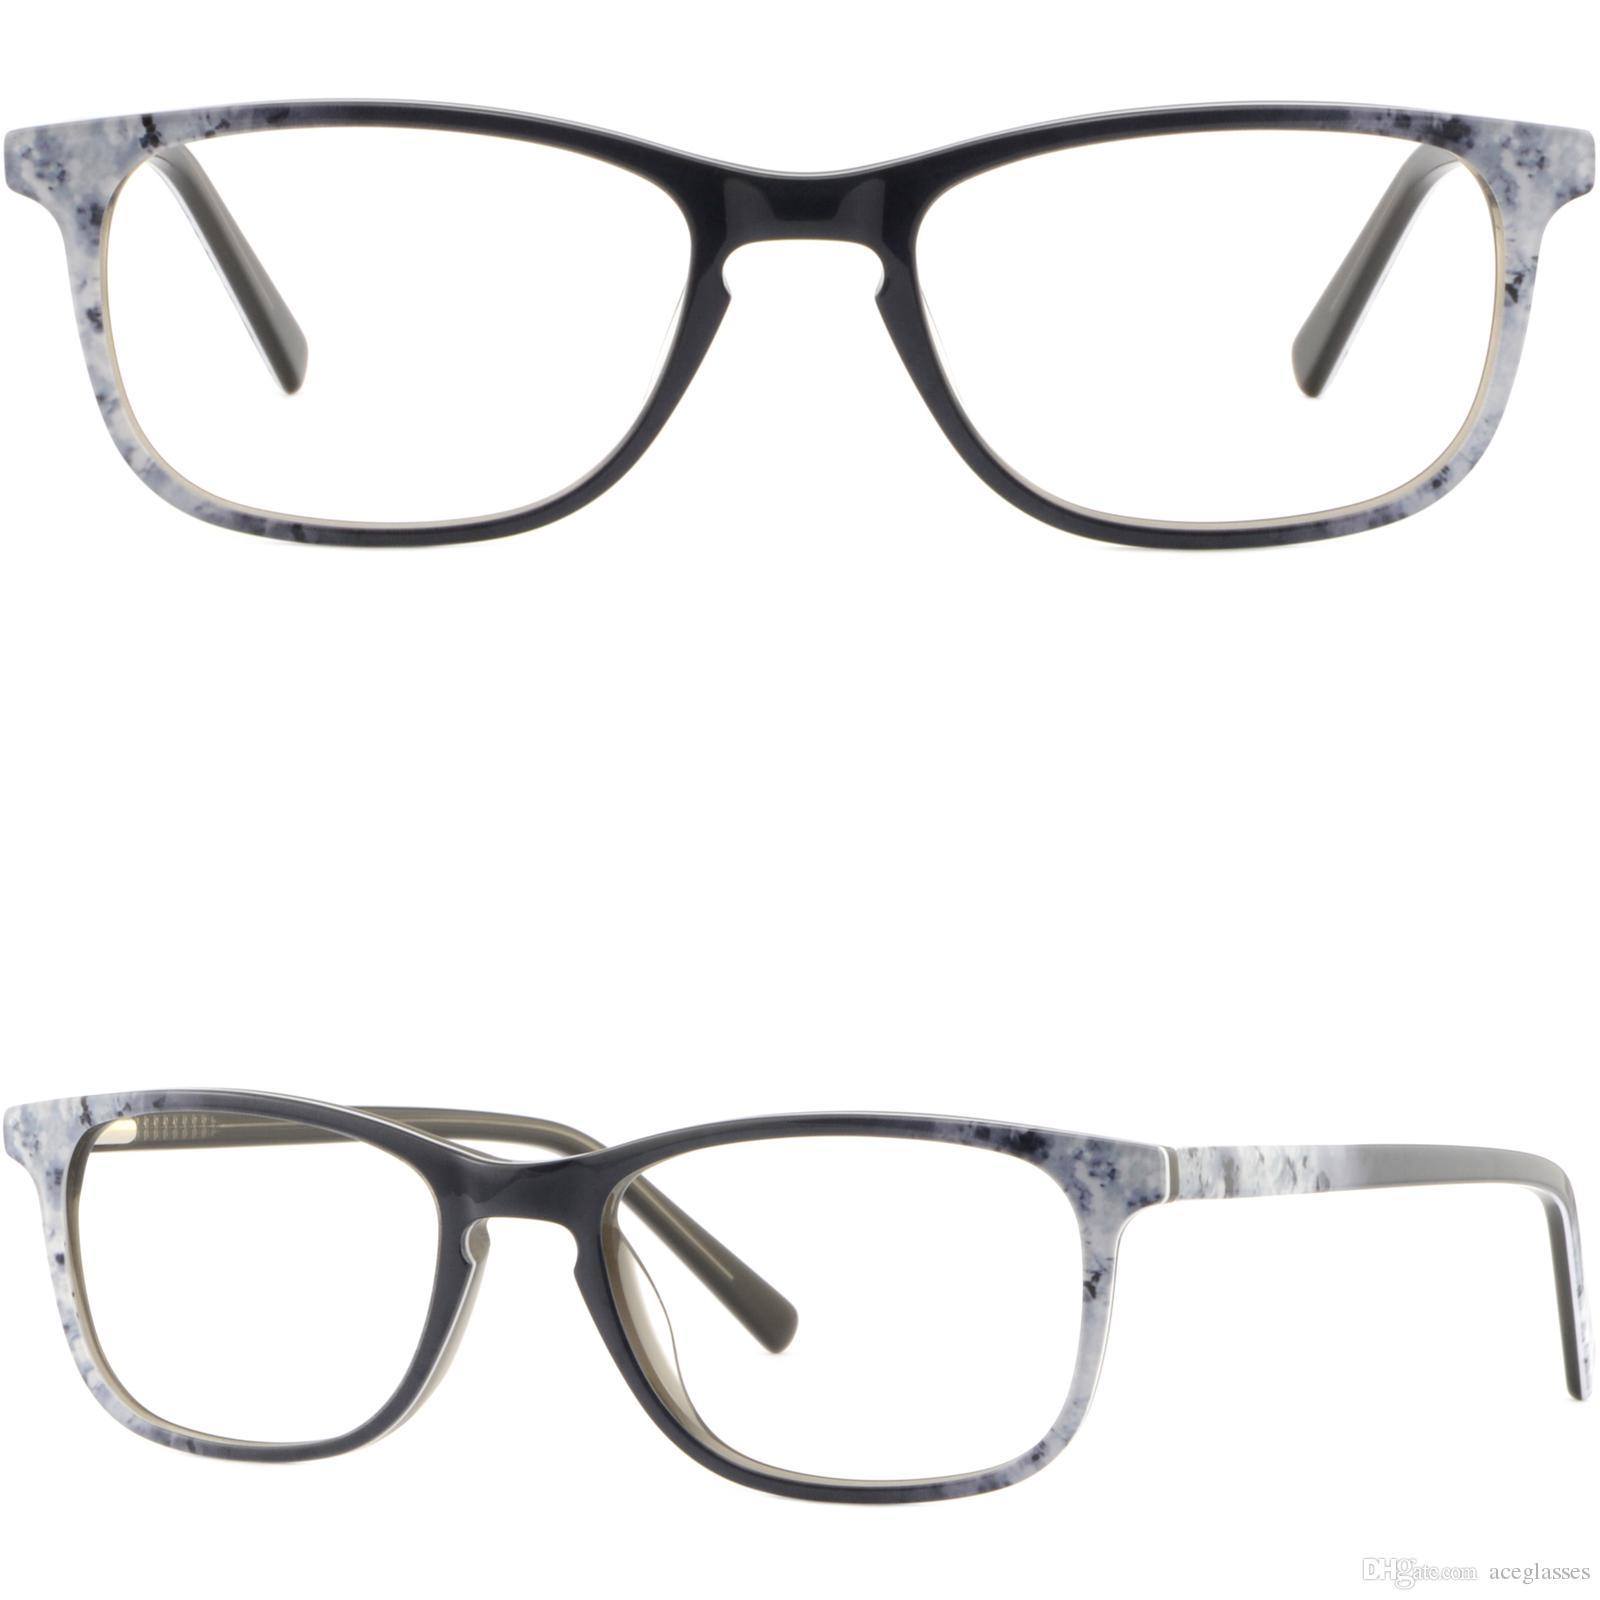 46a84b20658 Light Mens Women Acetate Plastic Frame Rectangle Prescription Glasses White  Grey Glasses Frame Online with  31.08 Piece on Aceglasses s Store